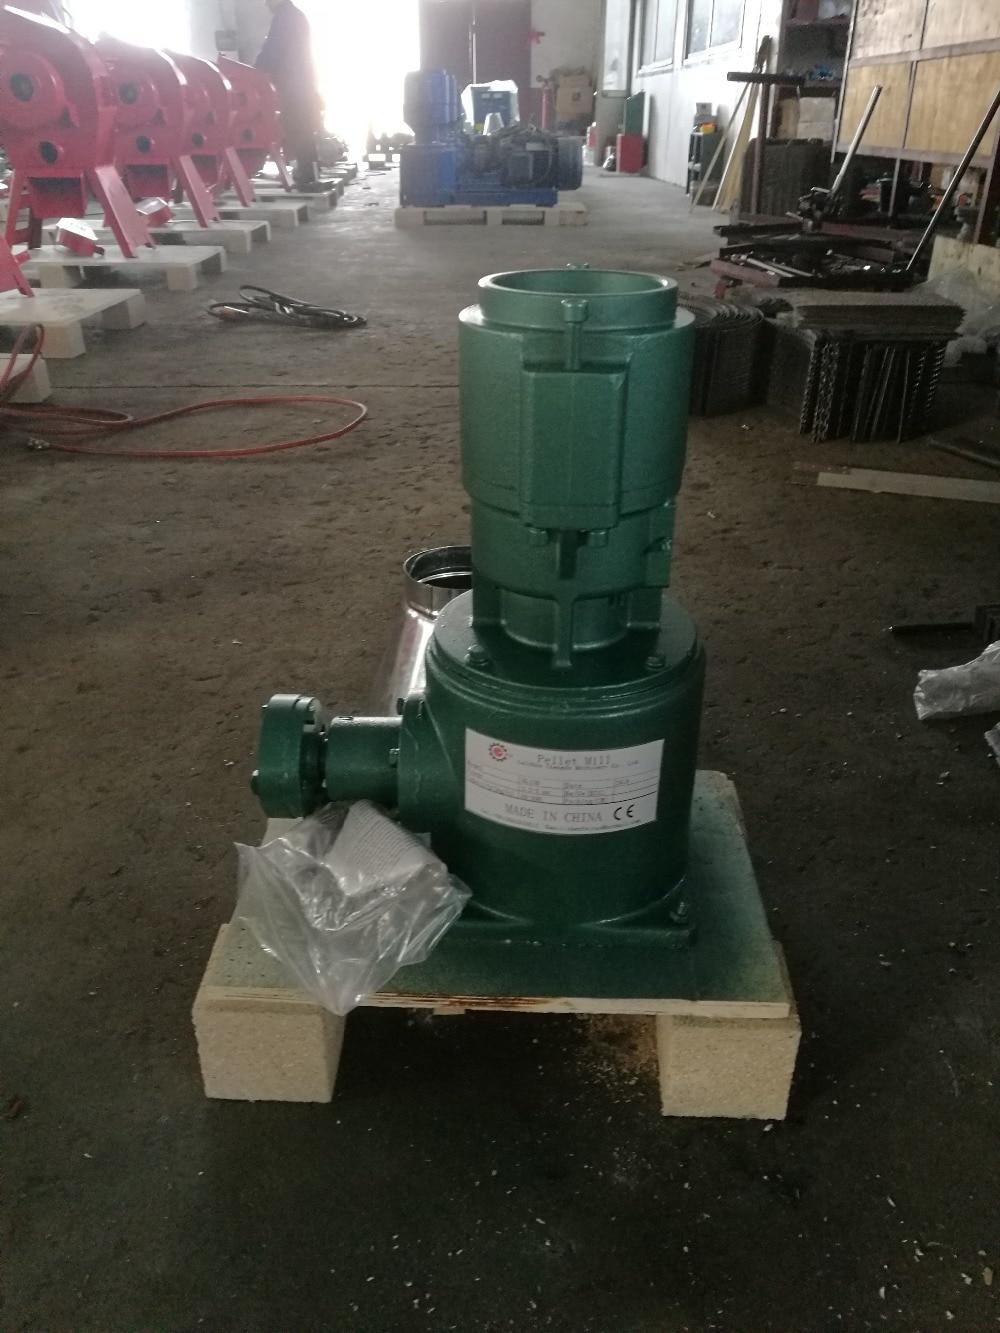 The head of KL120 pellet mill pellet making machine